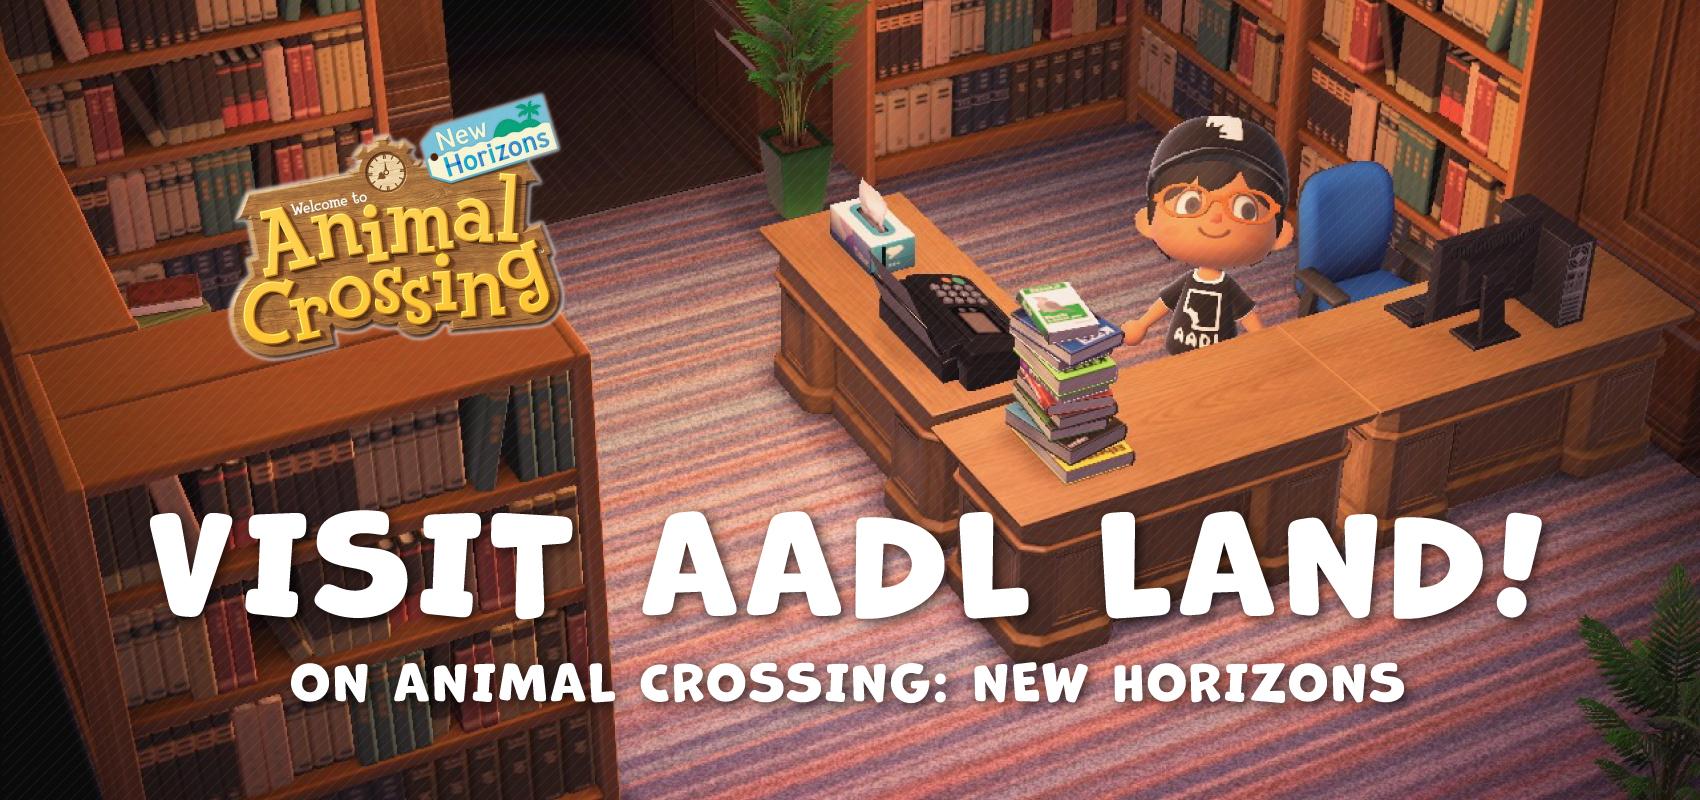 Animal Crossing Tour. .